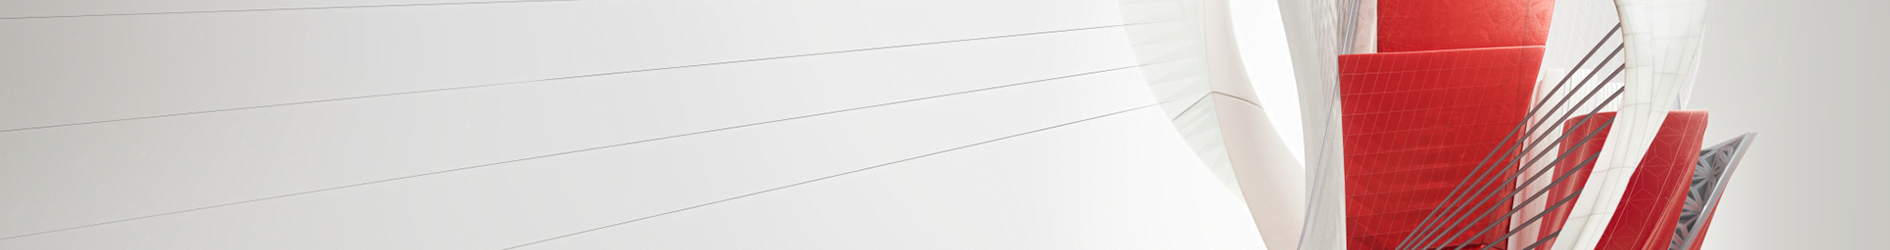 AutoCAD-Banner